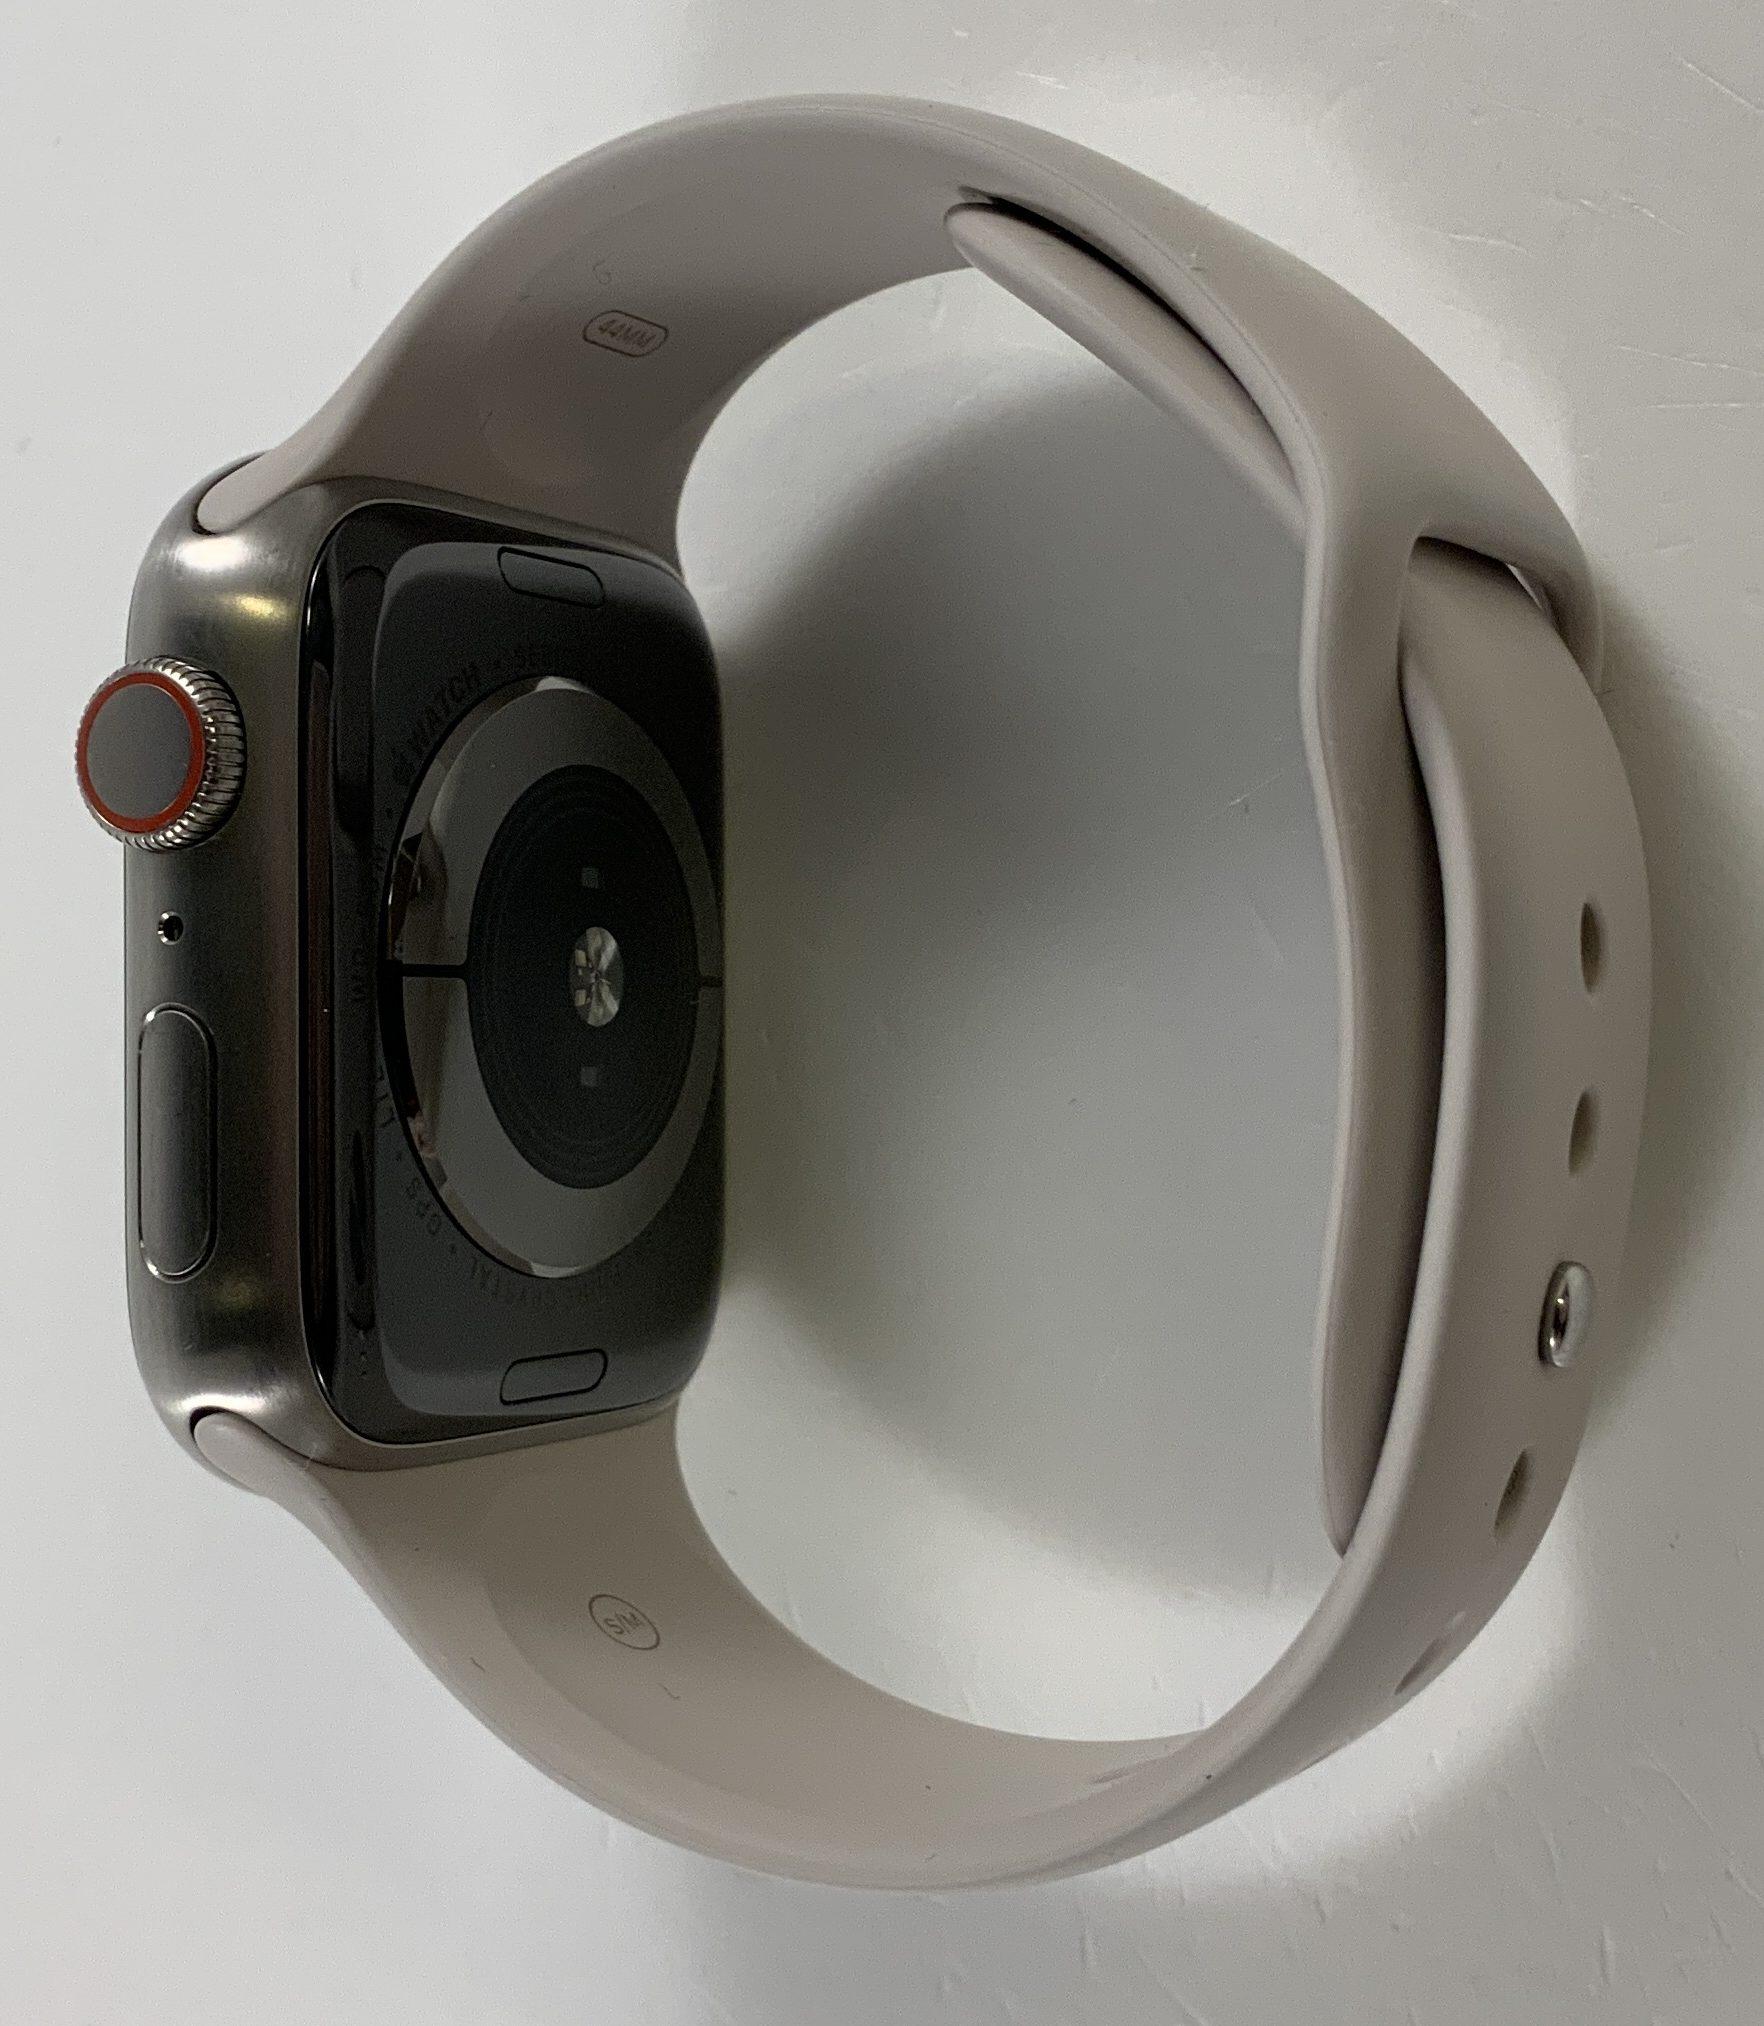 Watch Series 5 Steel Cellular (44mm), Titanium, Kuva 2